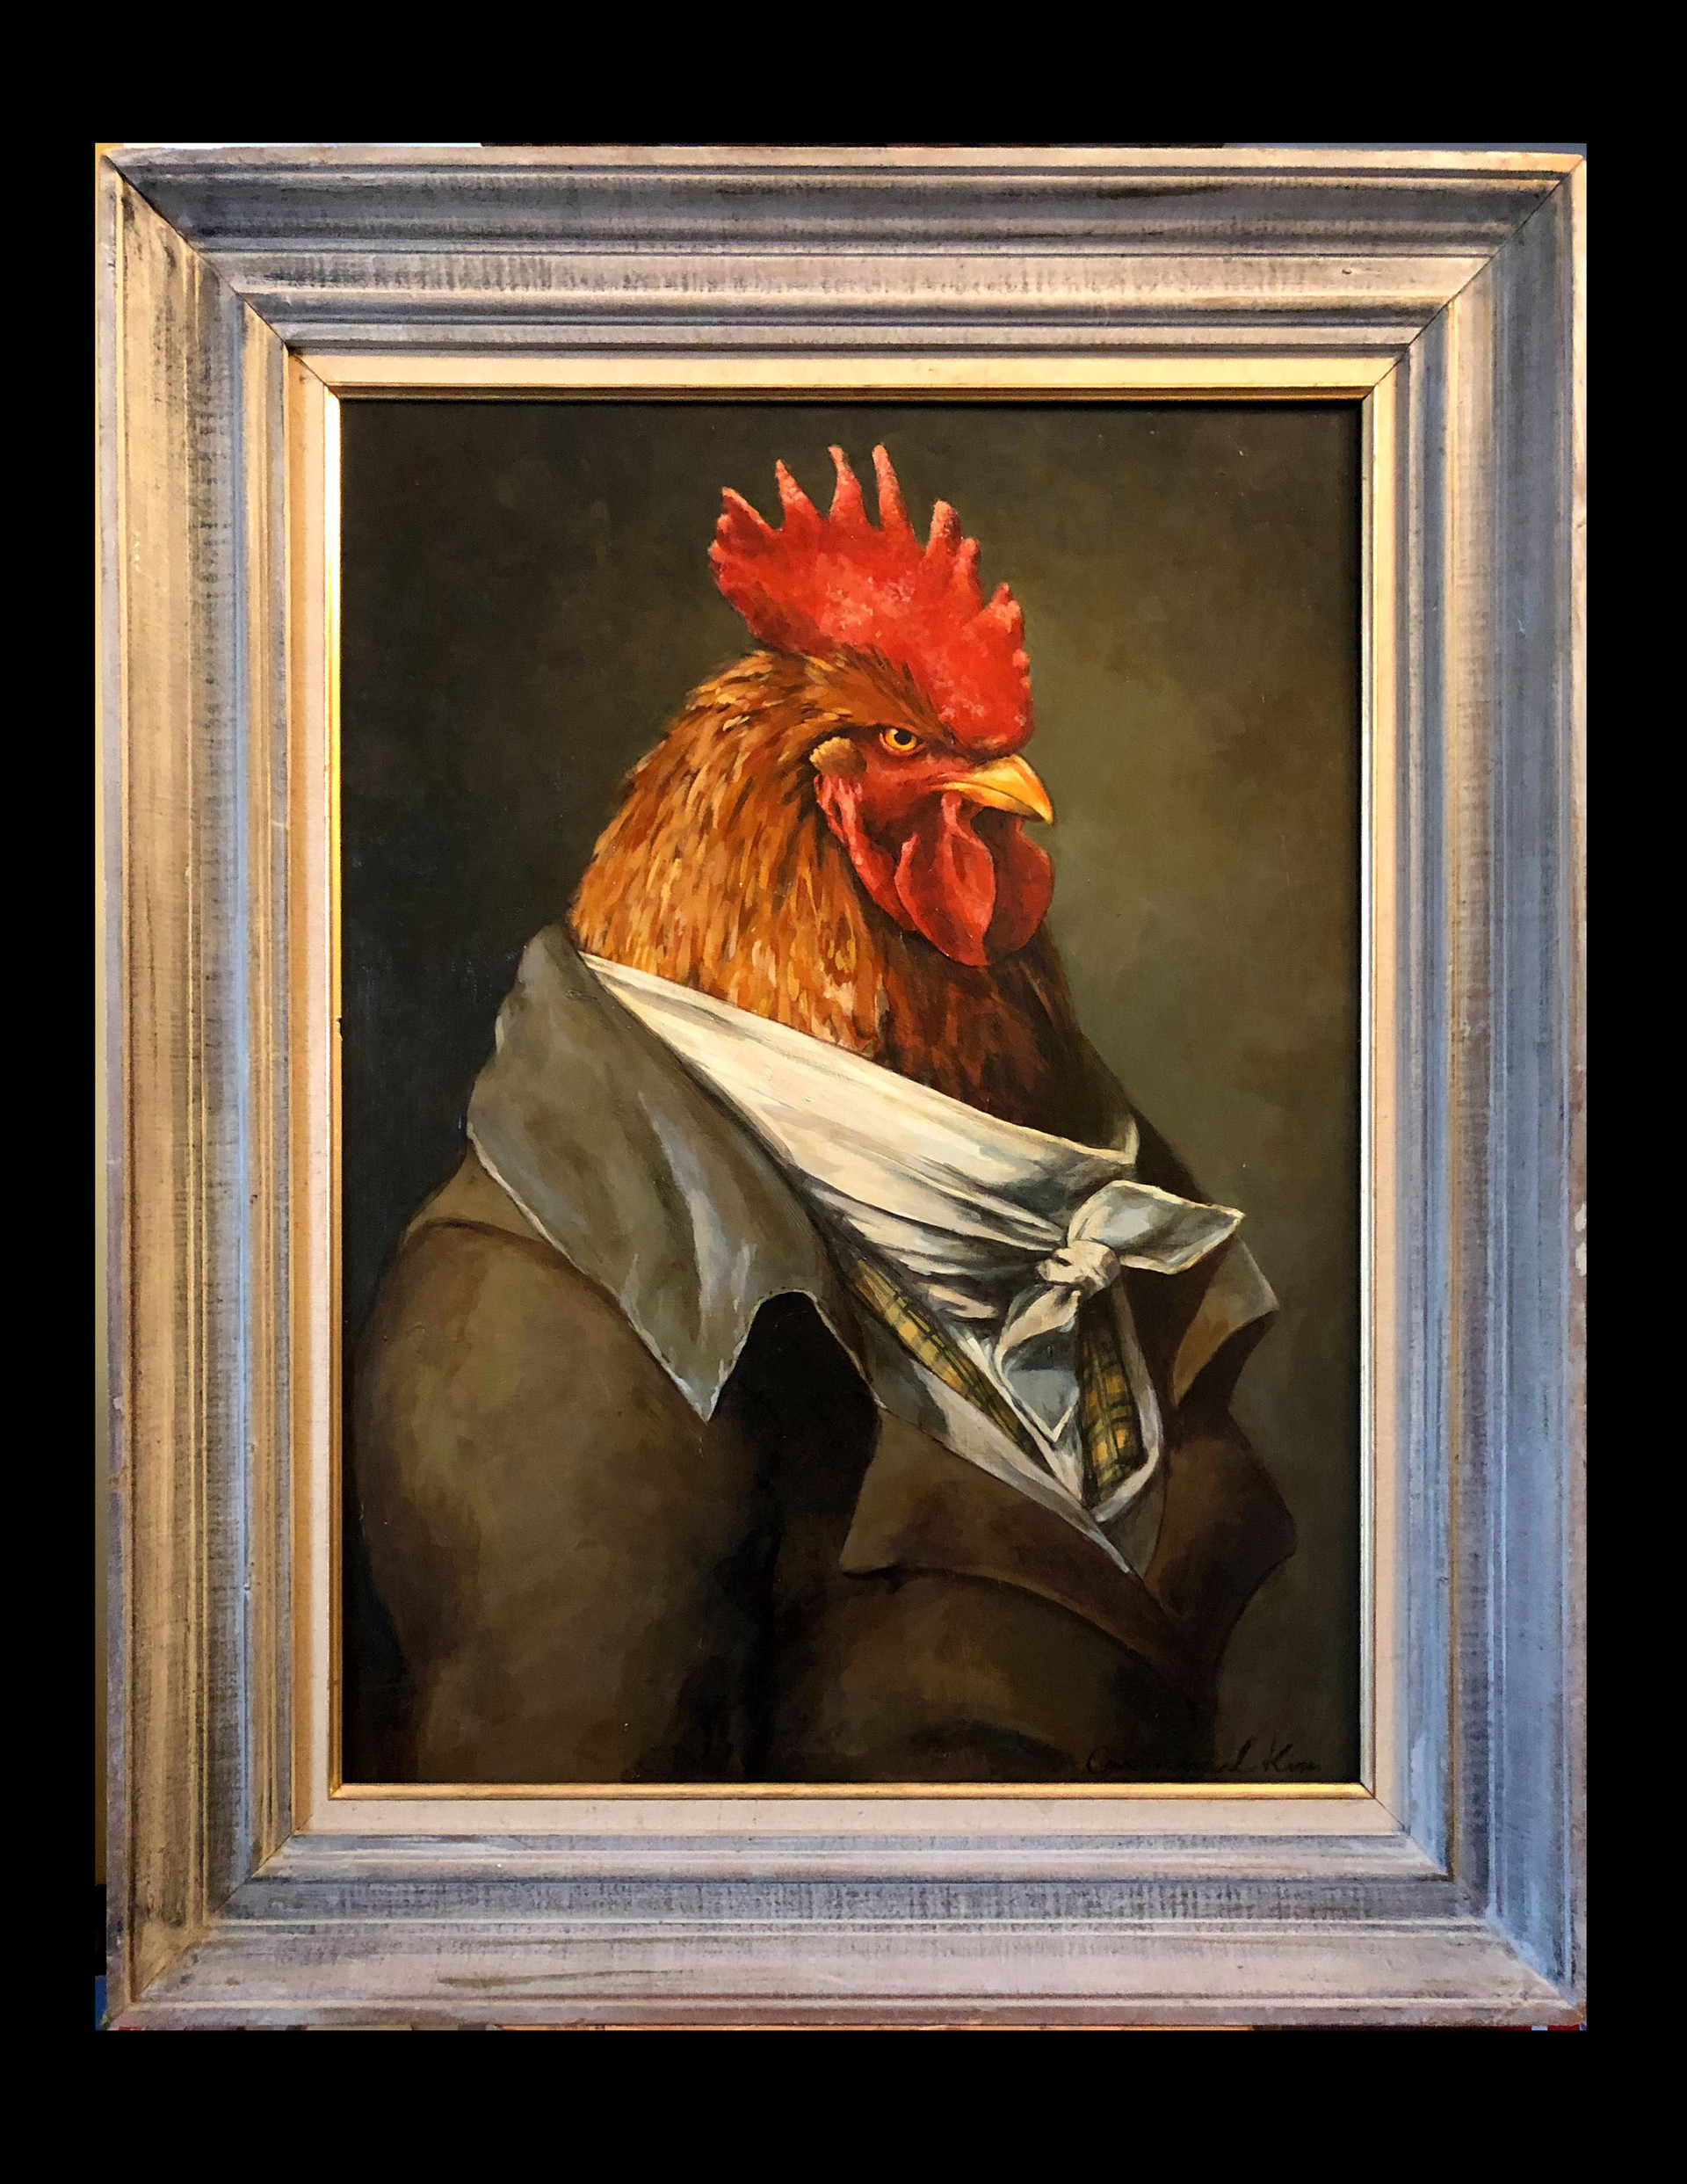 """The Arrogant Rooster"""